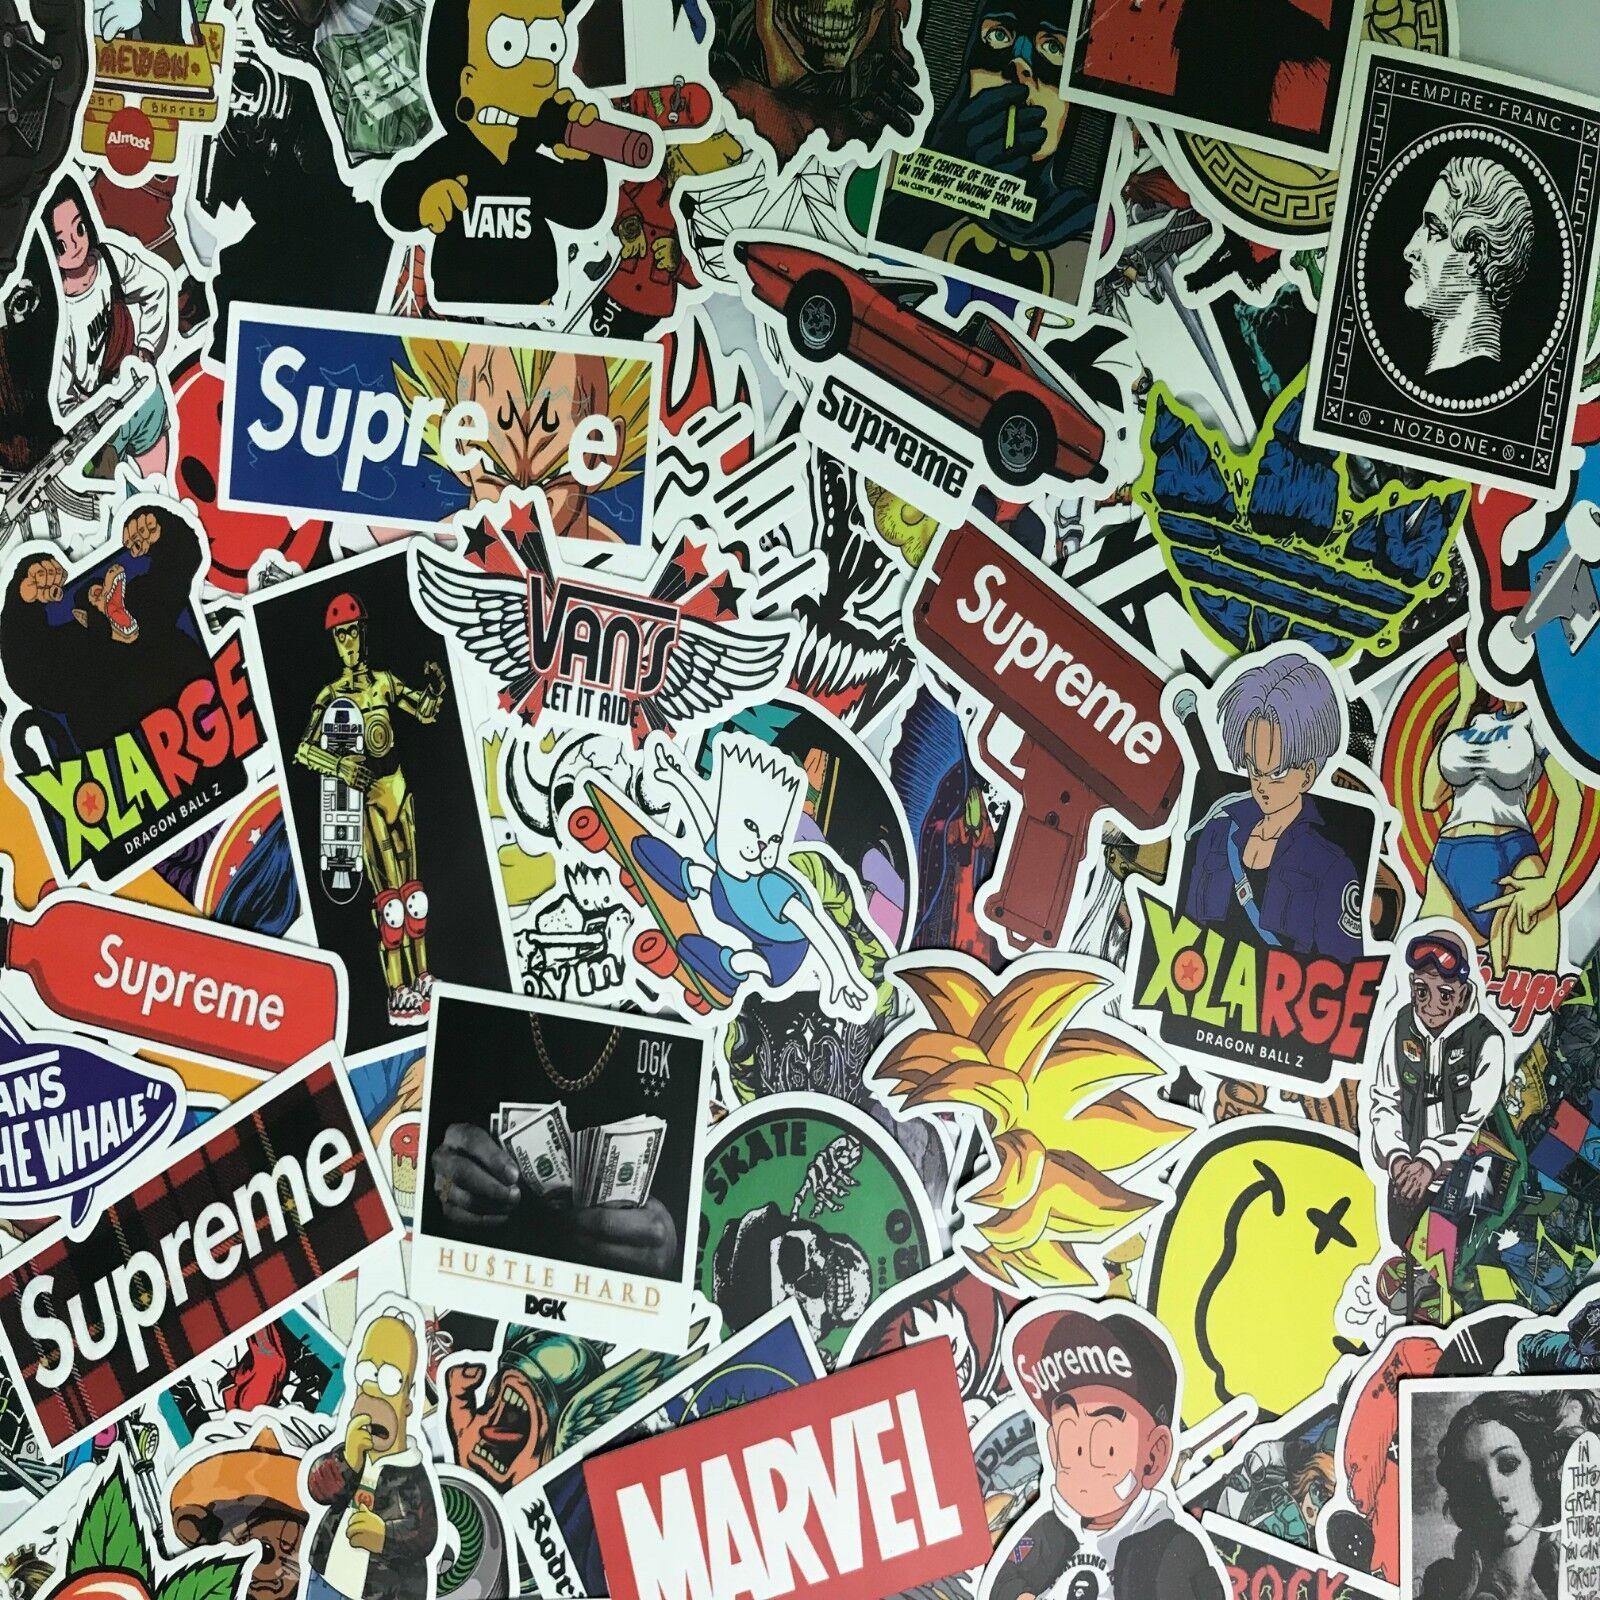 300 Random Skateboard Stickers Vinyl Laptop Luggage Decals D